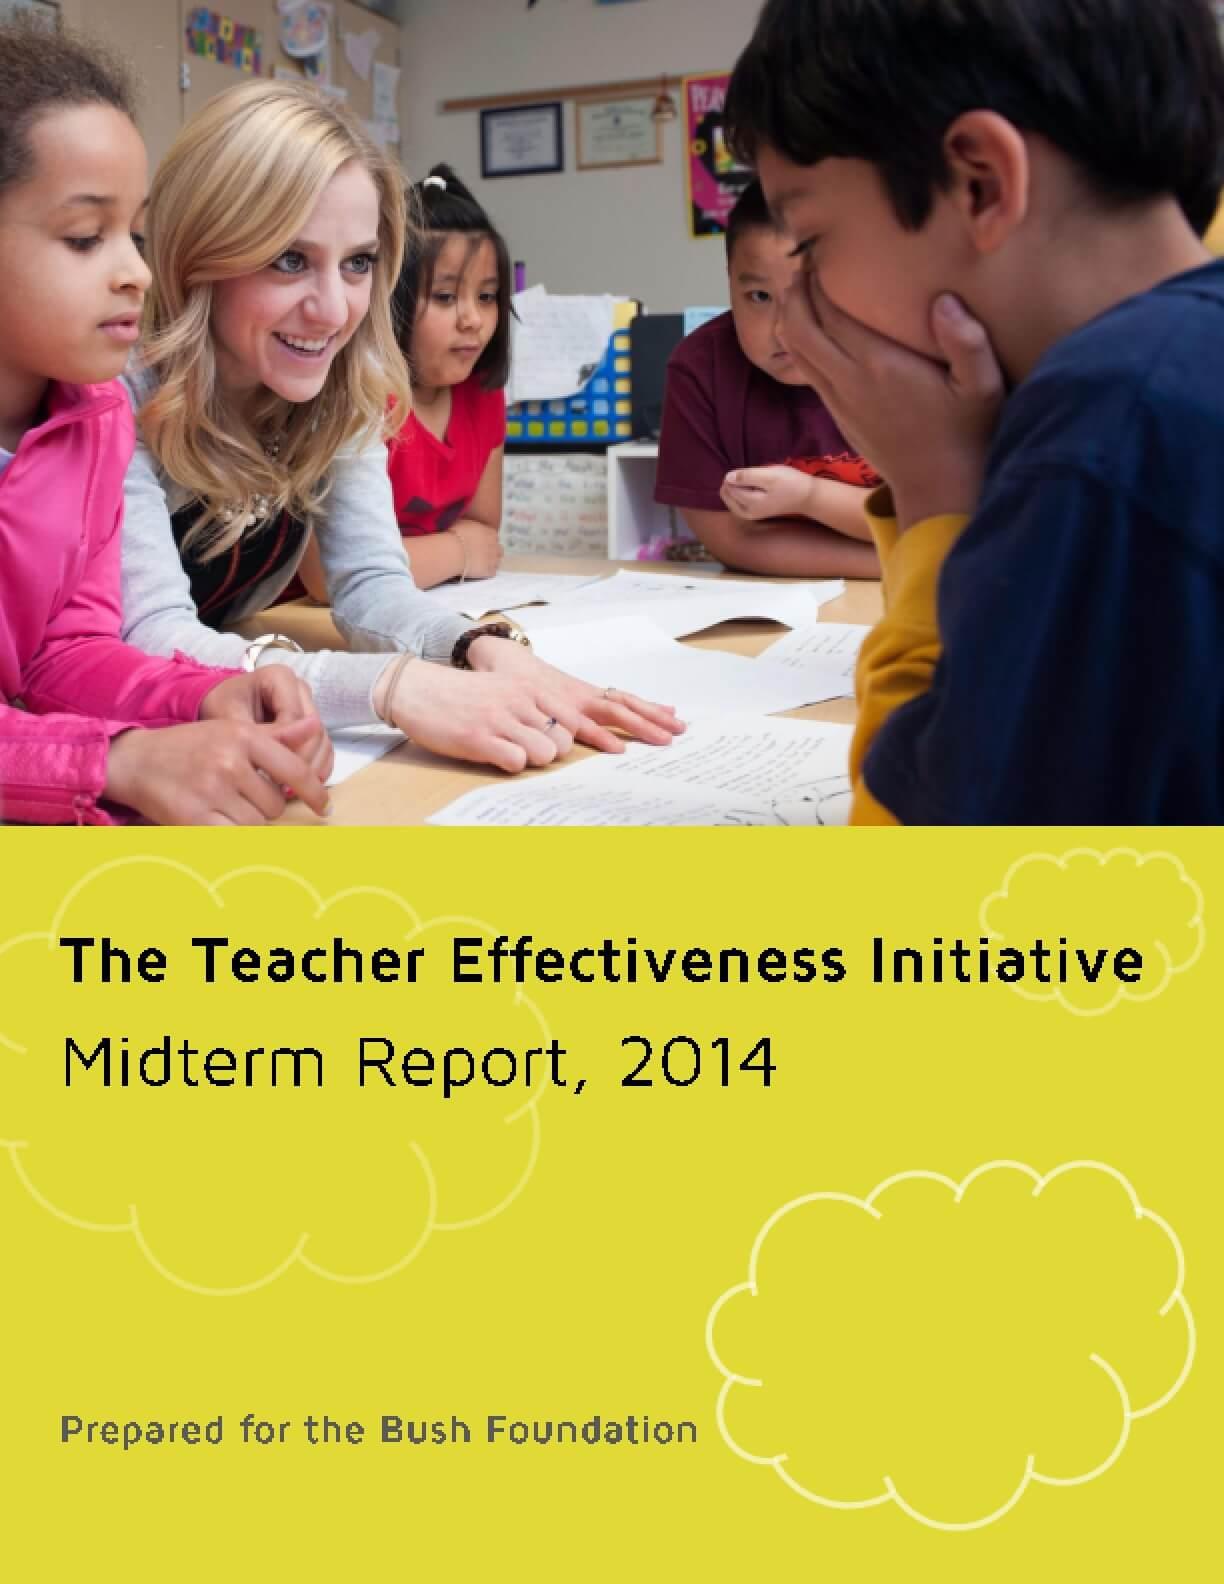 The Teacher Effectiveness Initiative Midterm Report, 2014